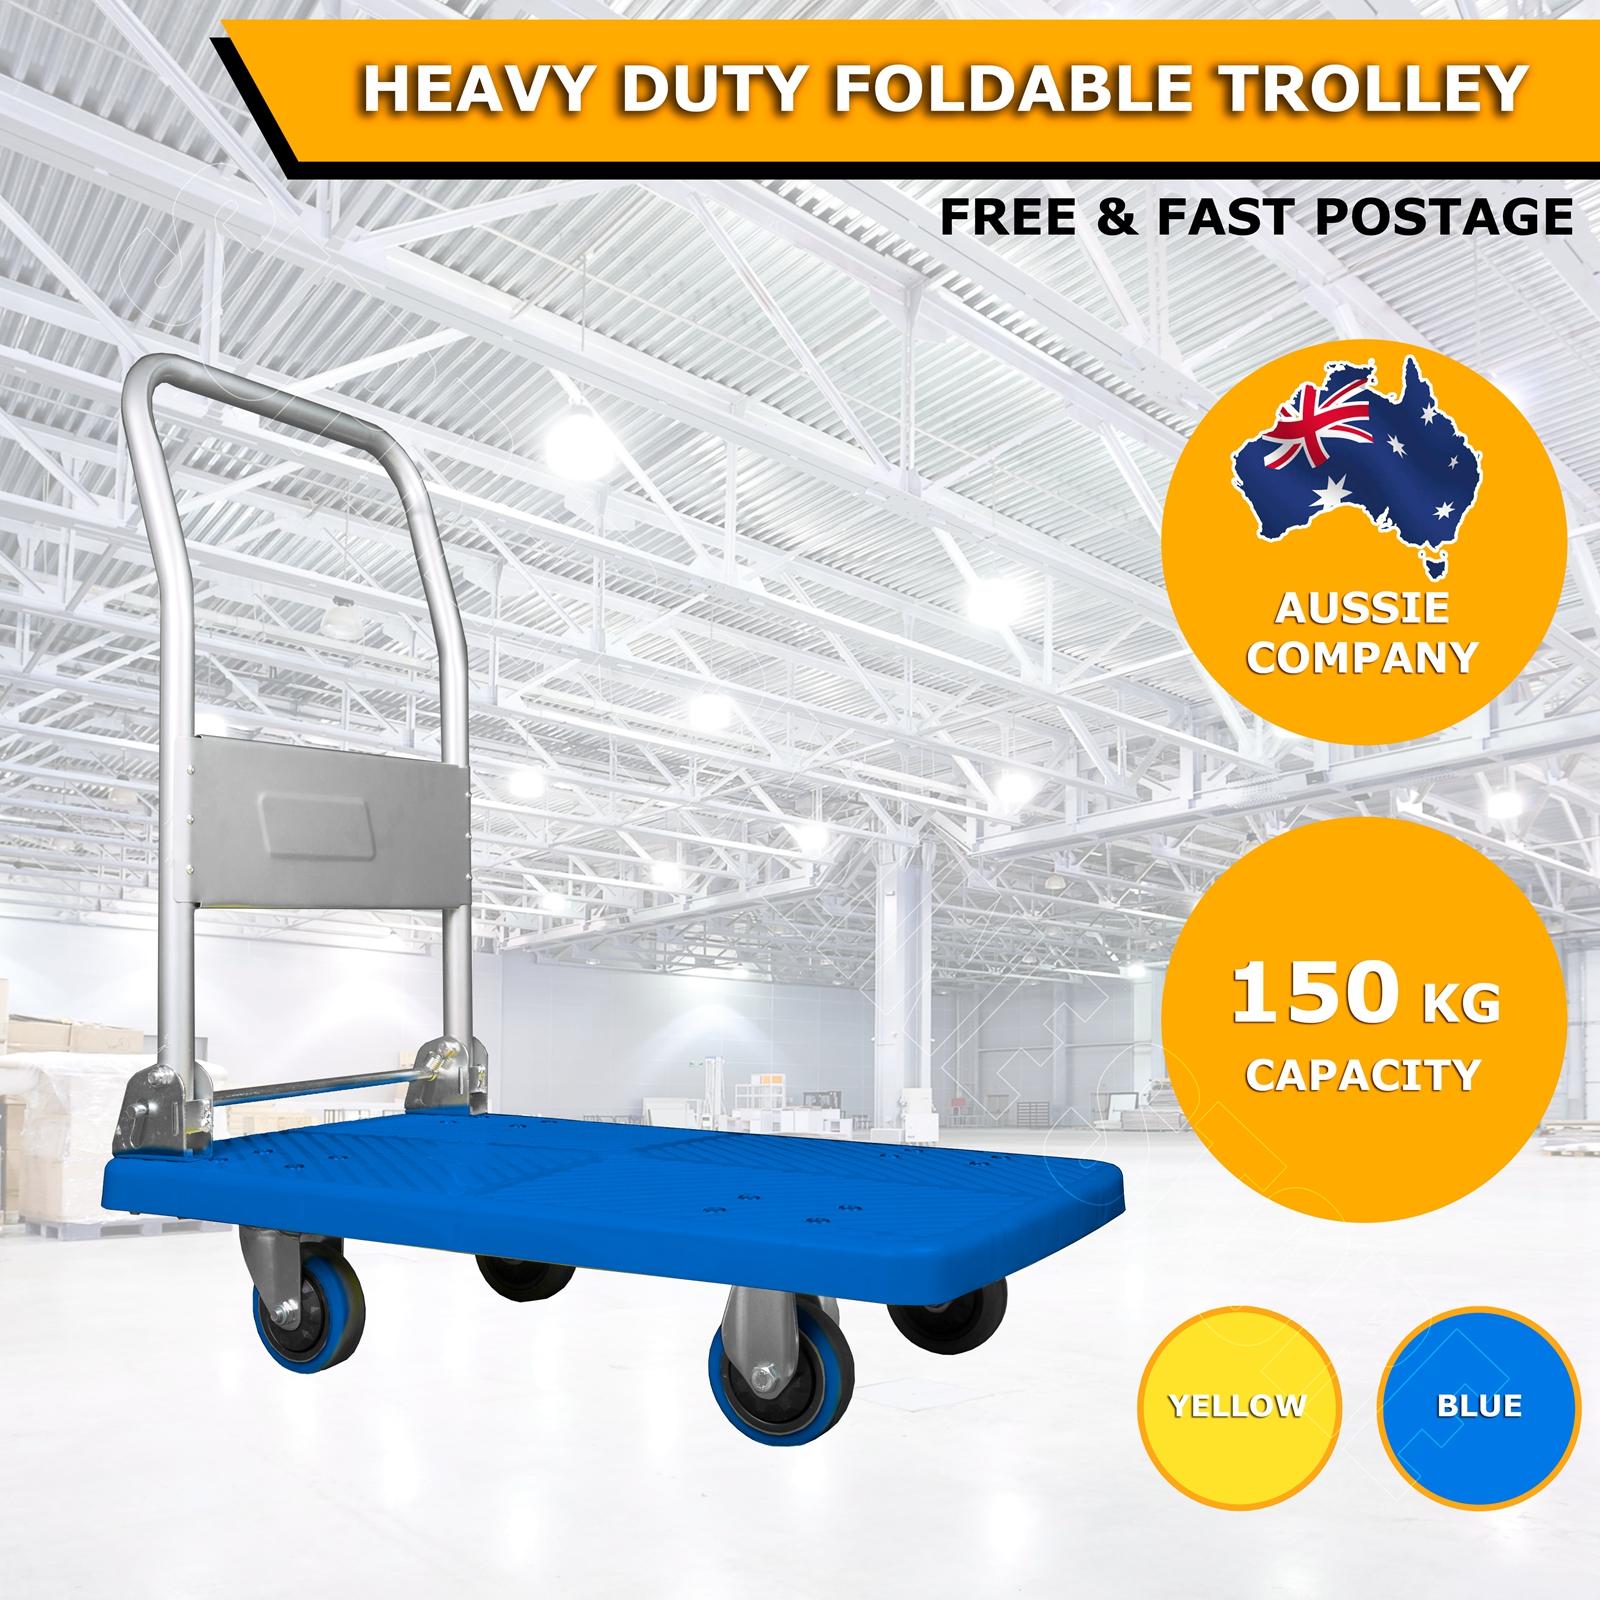 200-150-KG-Folding-Iron-Heavy-Duty-Platform-Trolley-Hand-Truck-Foldable-Cart